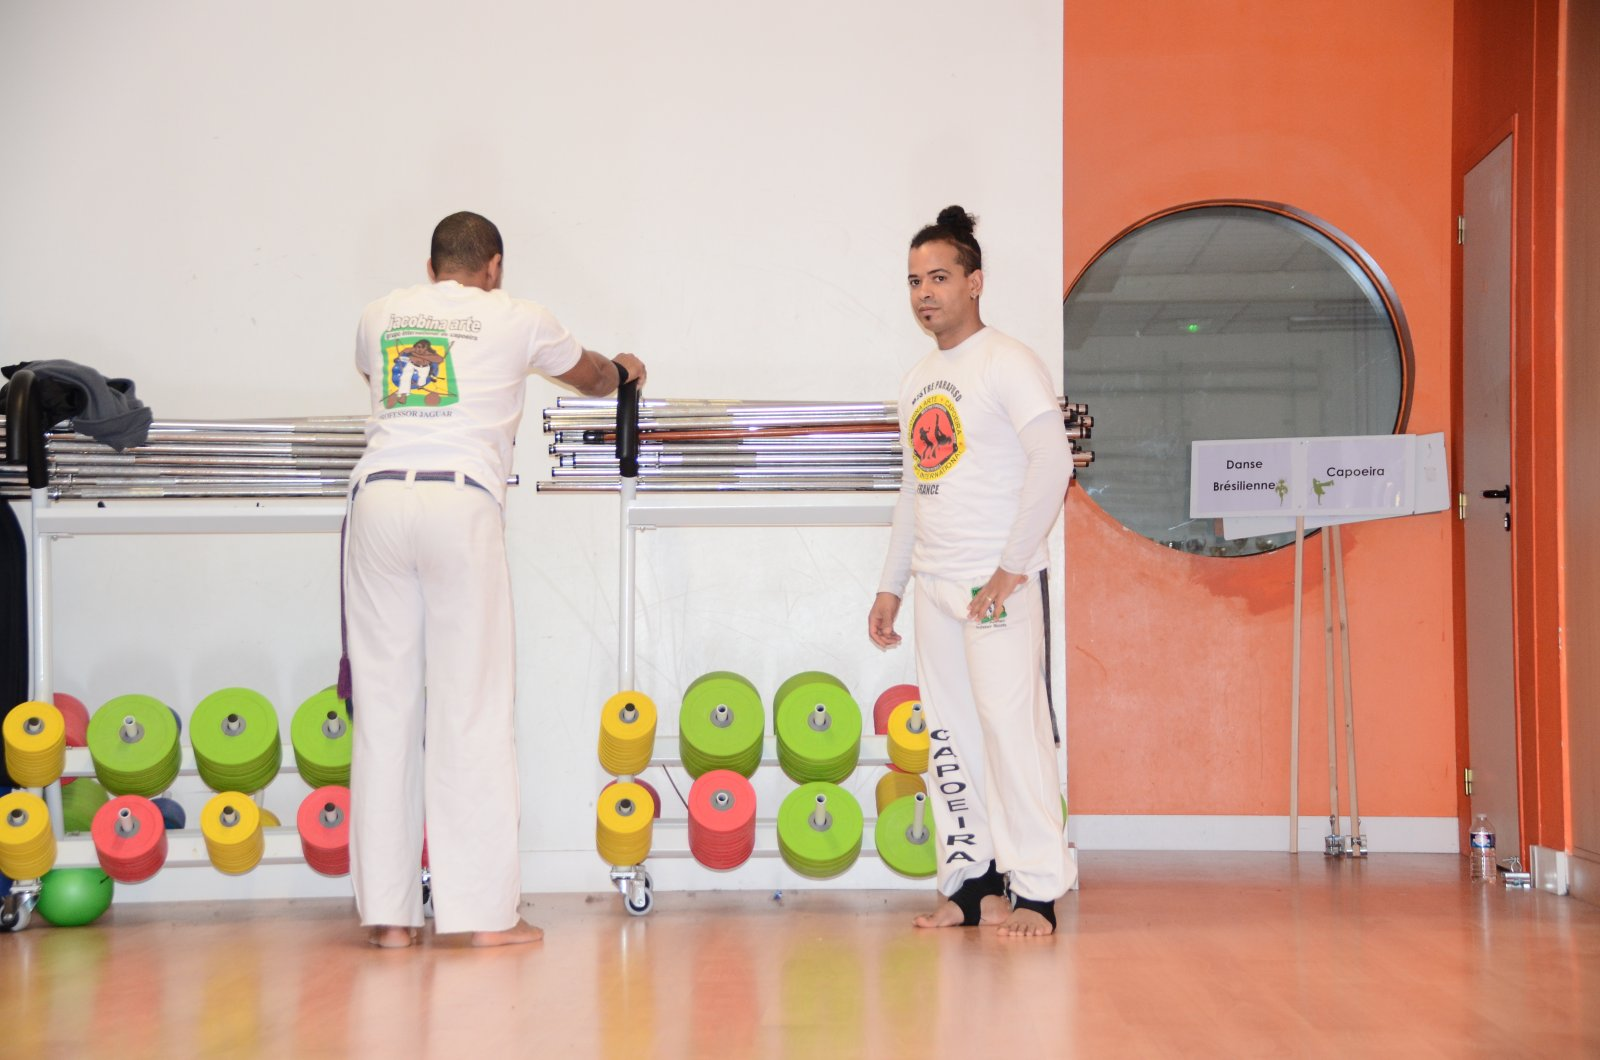 Roda E Galette 2018 Capoeira Nantes (35)